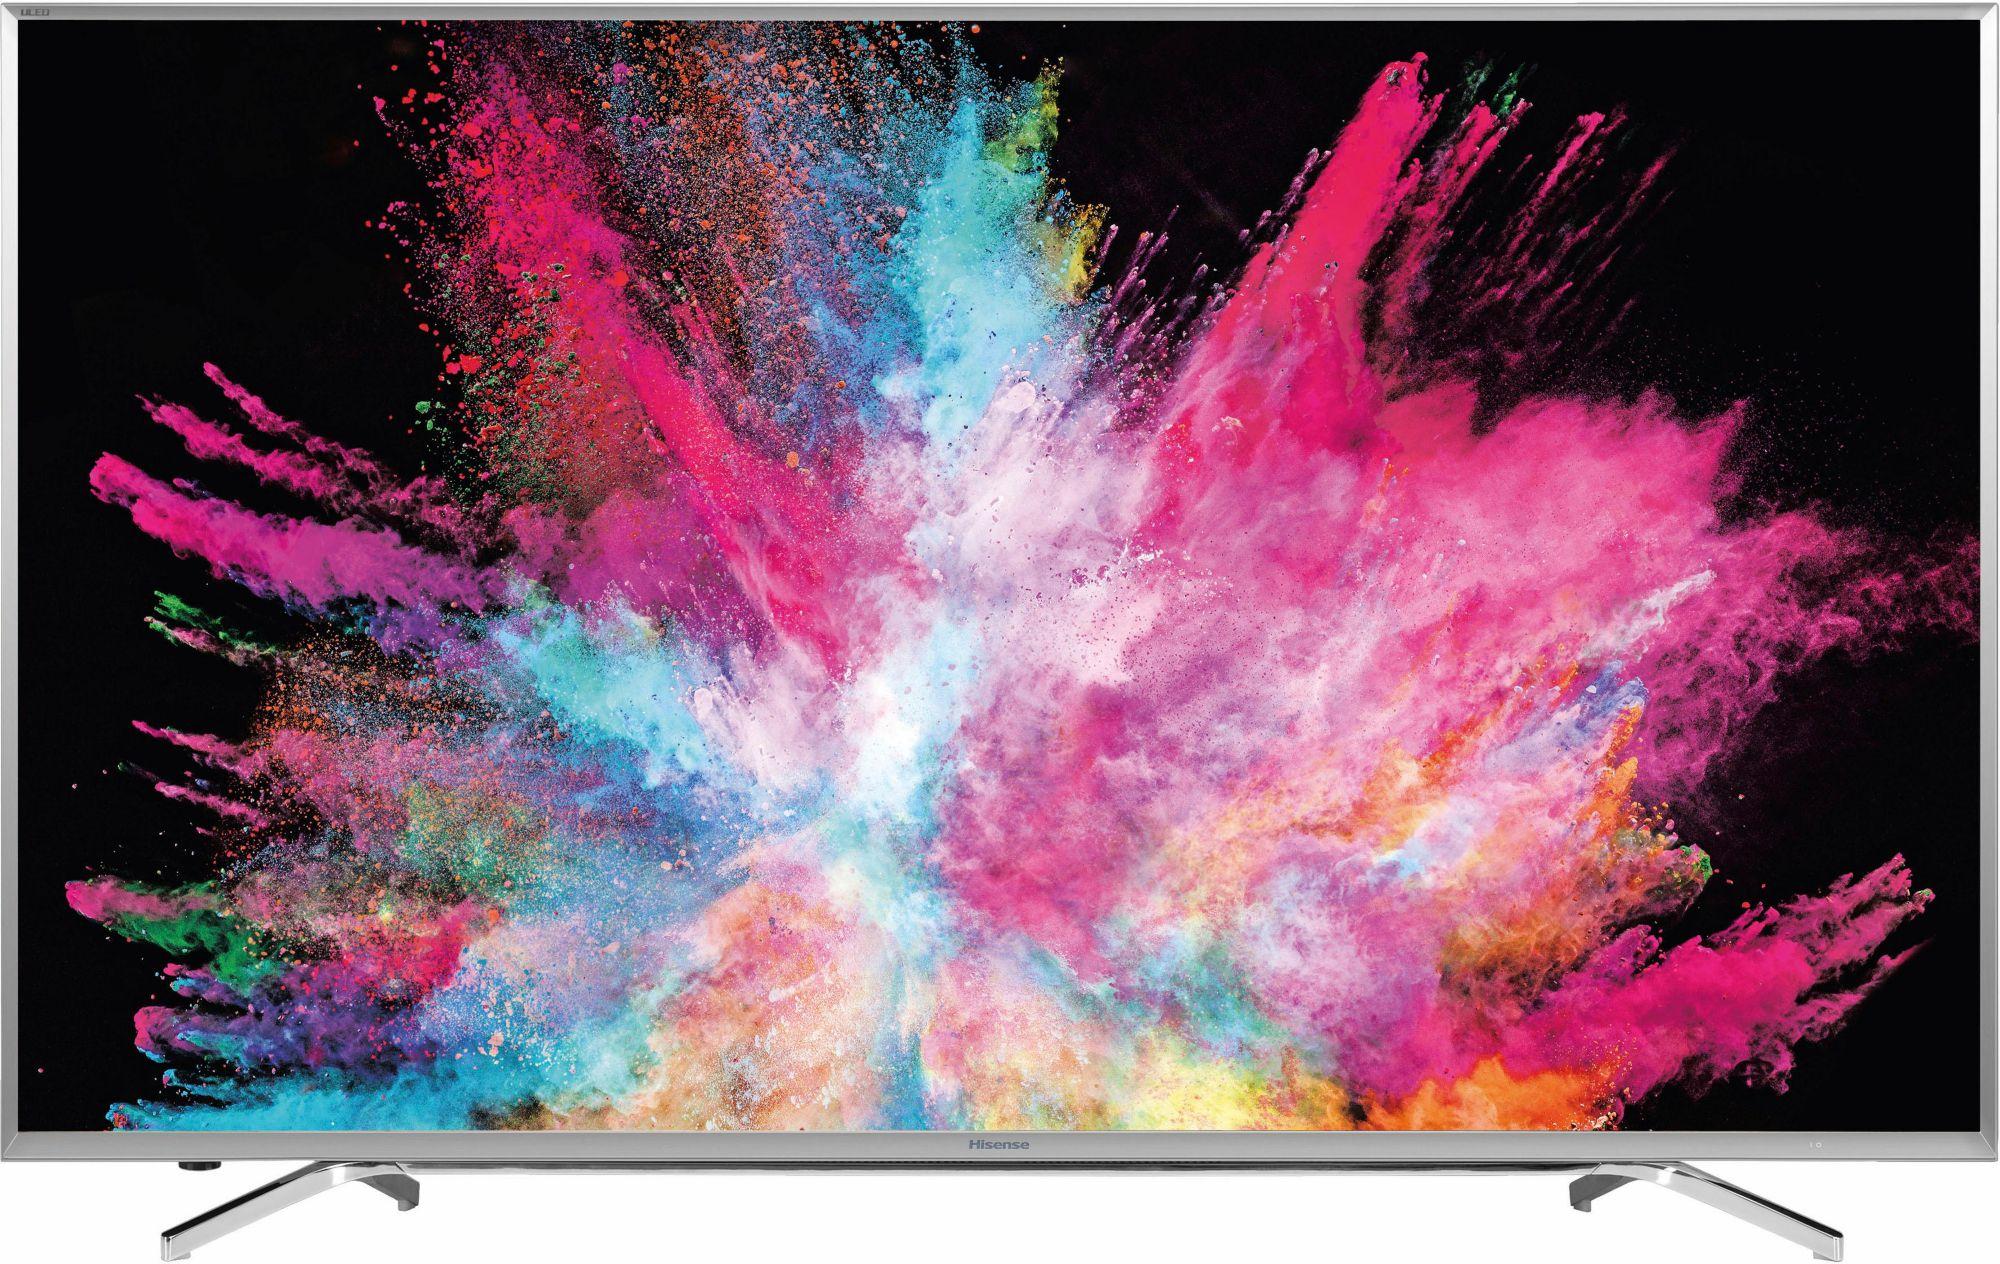 HISENSE Hisense H55M7000, LED Fernseher, 138 cm (55 Zoll), 2160p (4K Ultra HD), Smart-TV